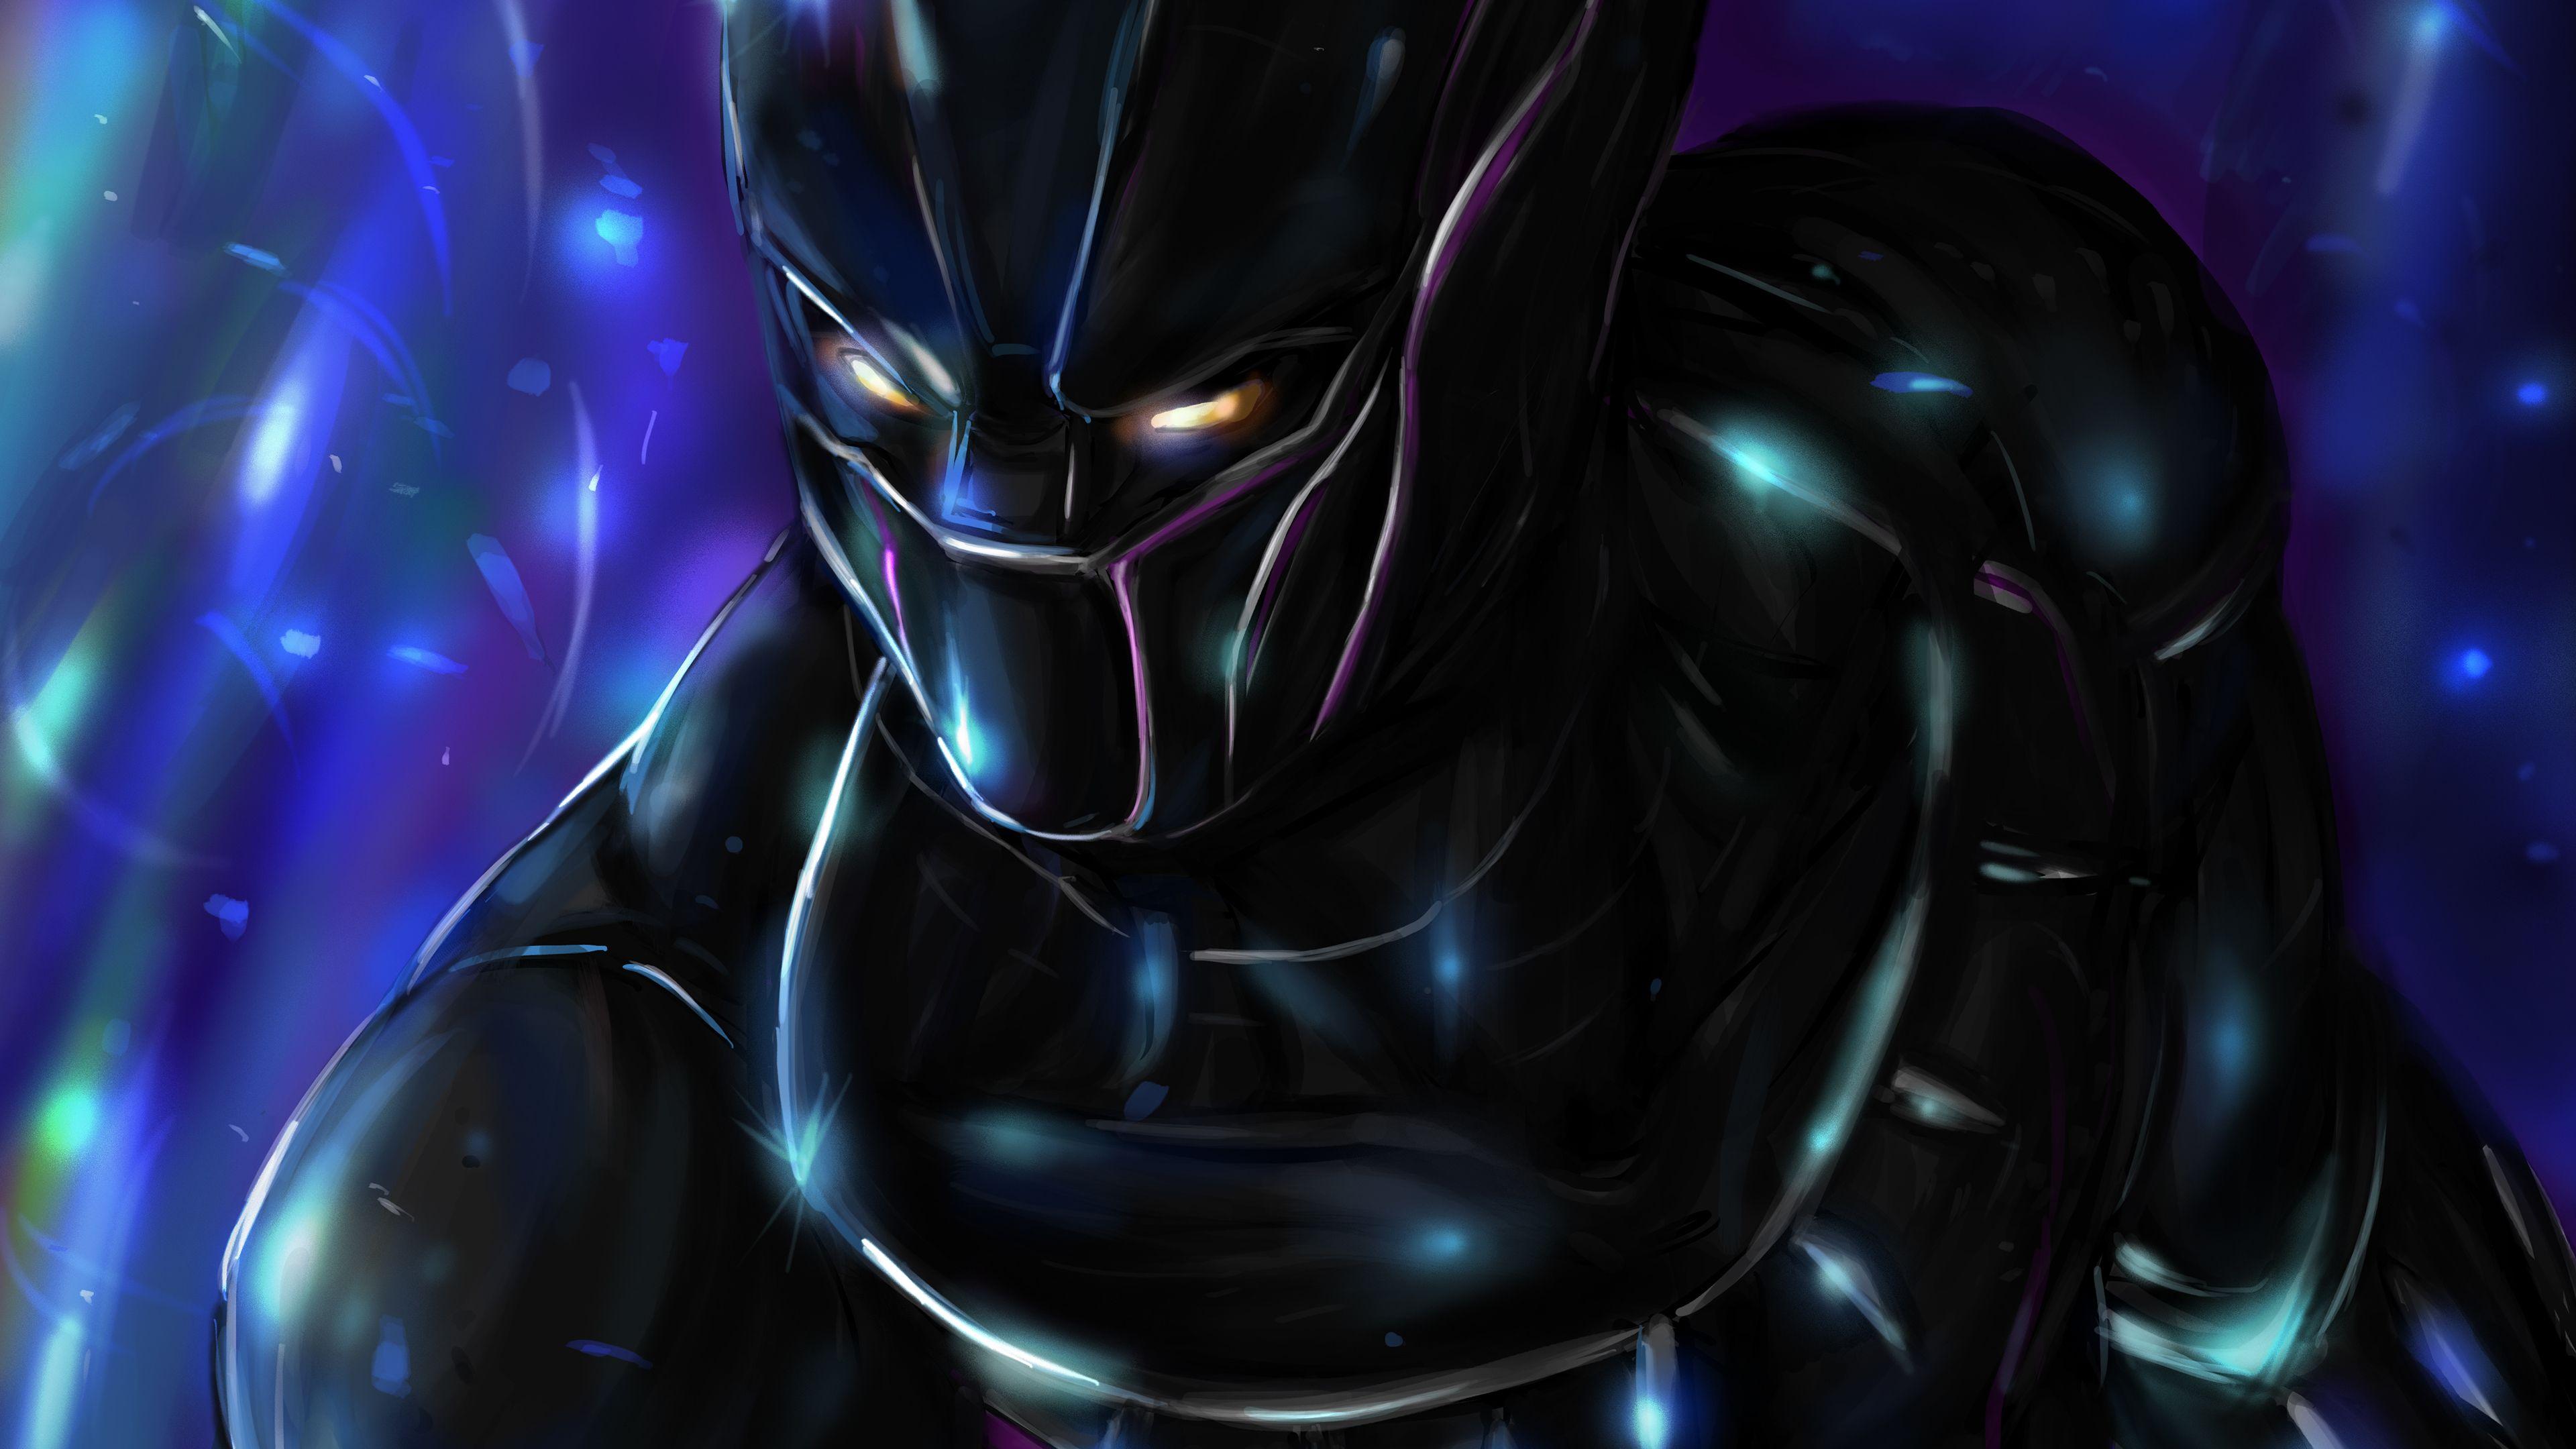 Black Panther 4k Artworks Superheroes Wallpapers Hd Wallpapers